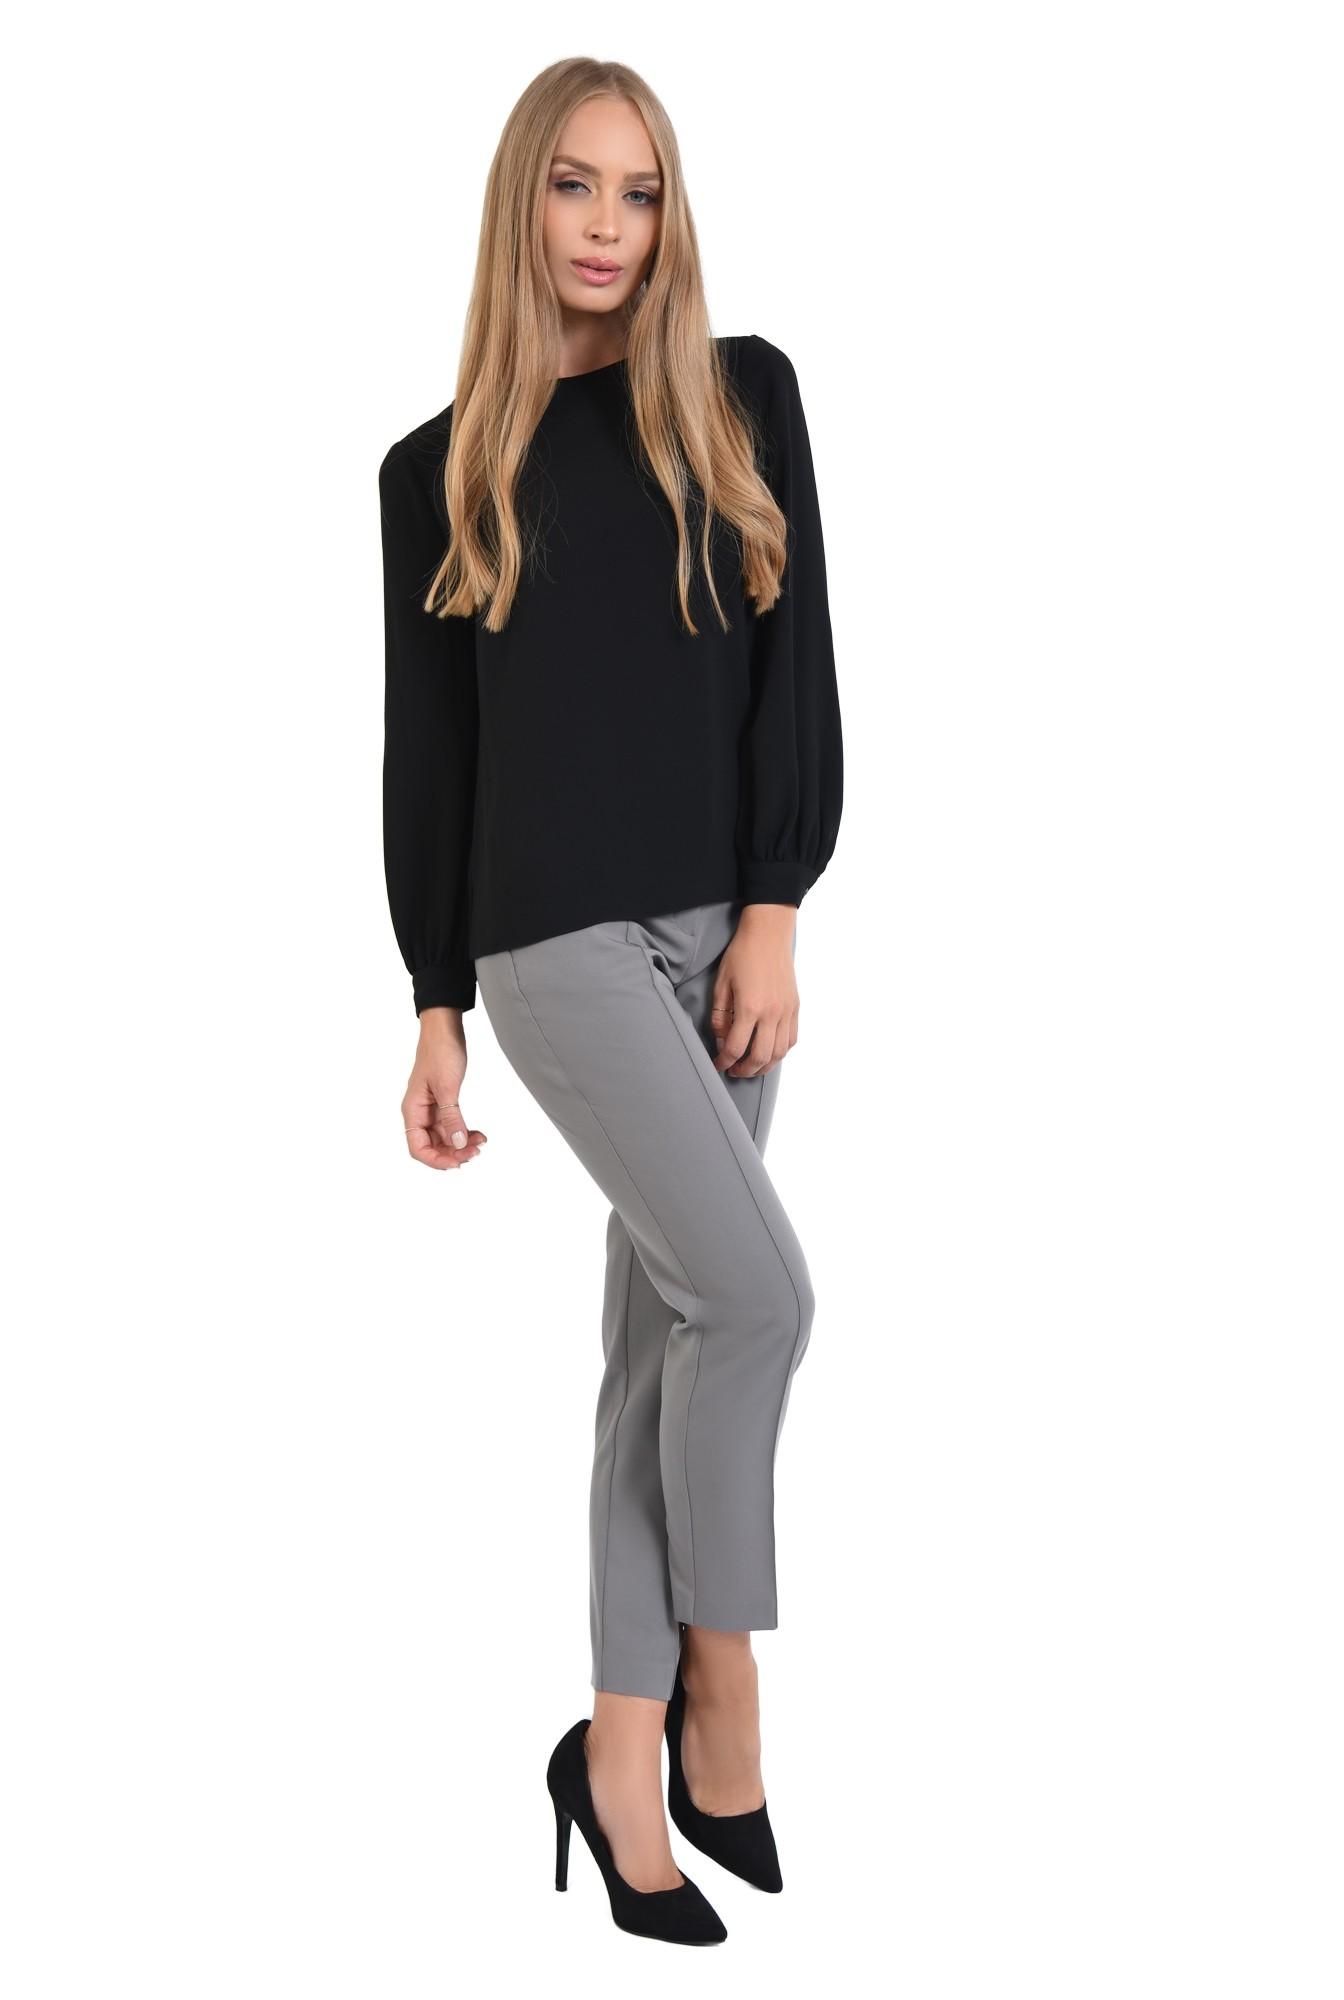 3 - 360 - bluza casual neagra, maneci cu mansete, tesatura fluida